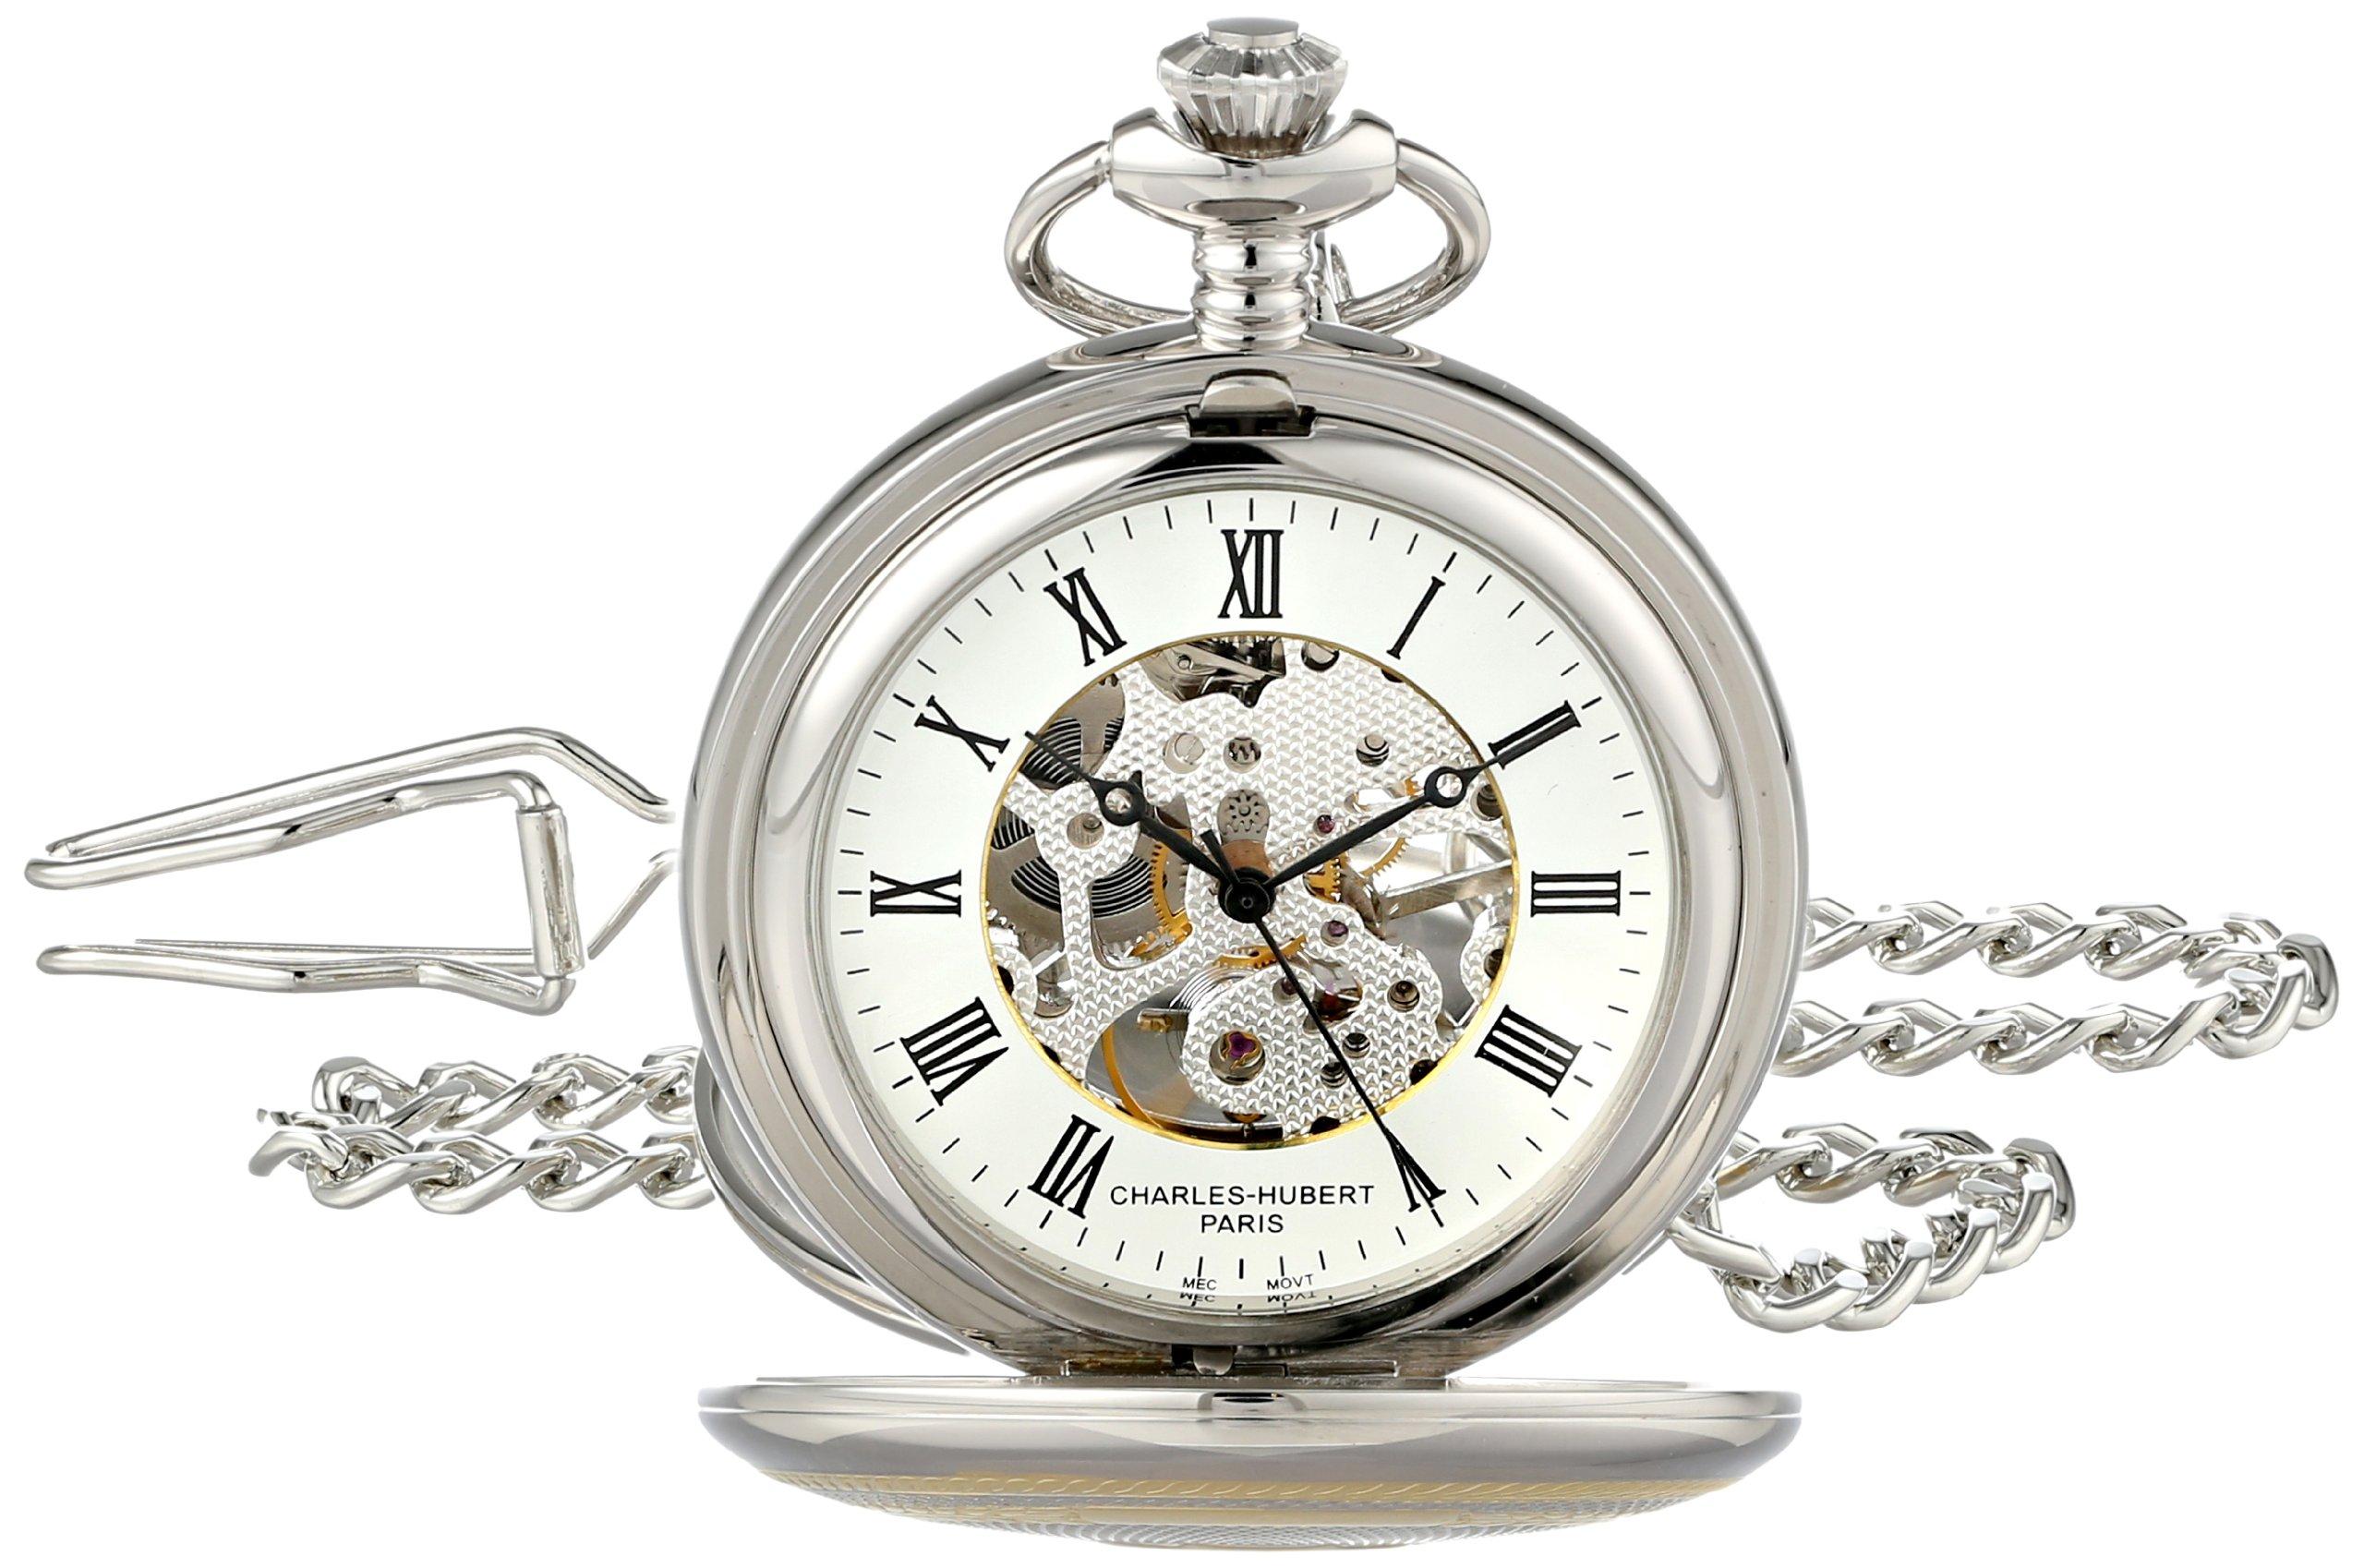 Charles-Hubert, Paris 3819 Two-Tone Mechanical Pocket Watch by CHARLES-HUBERT PARIS (Image #1)